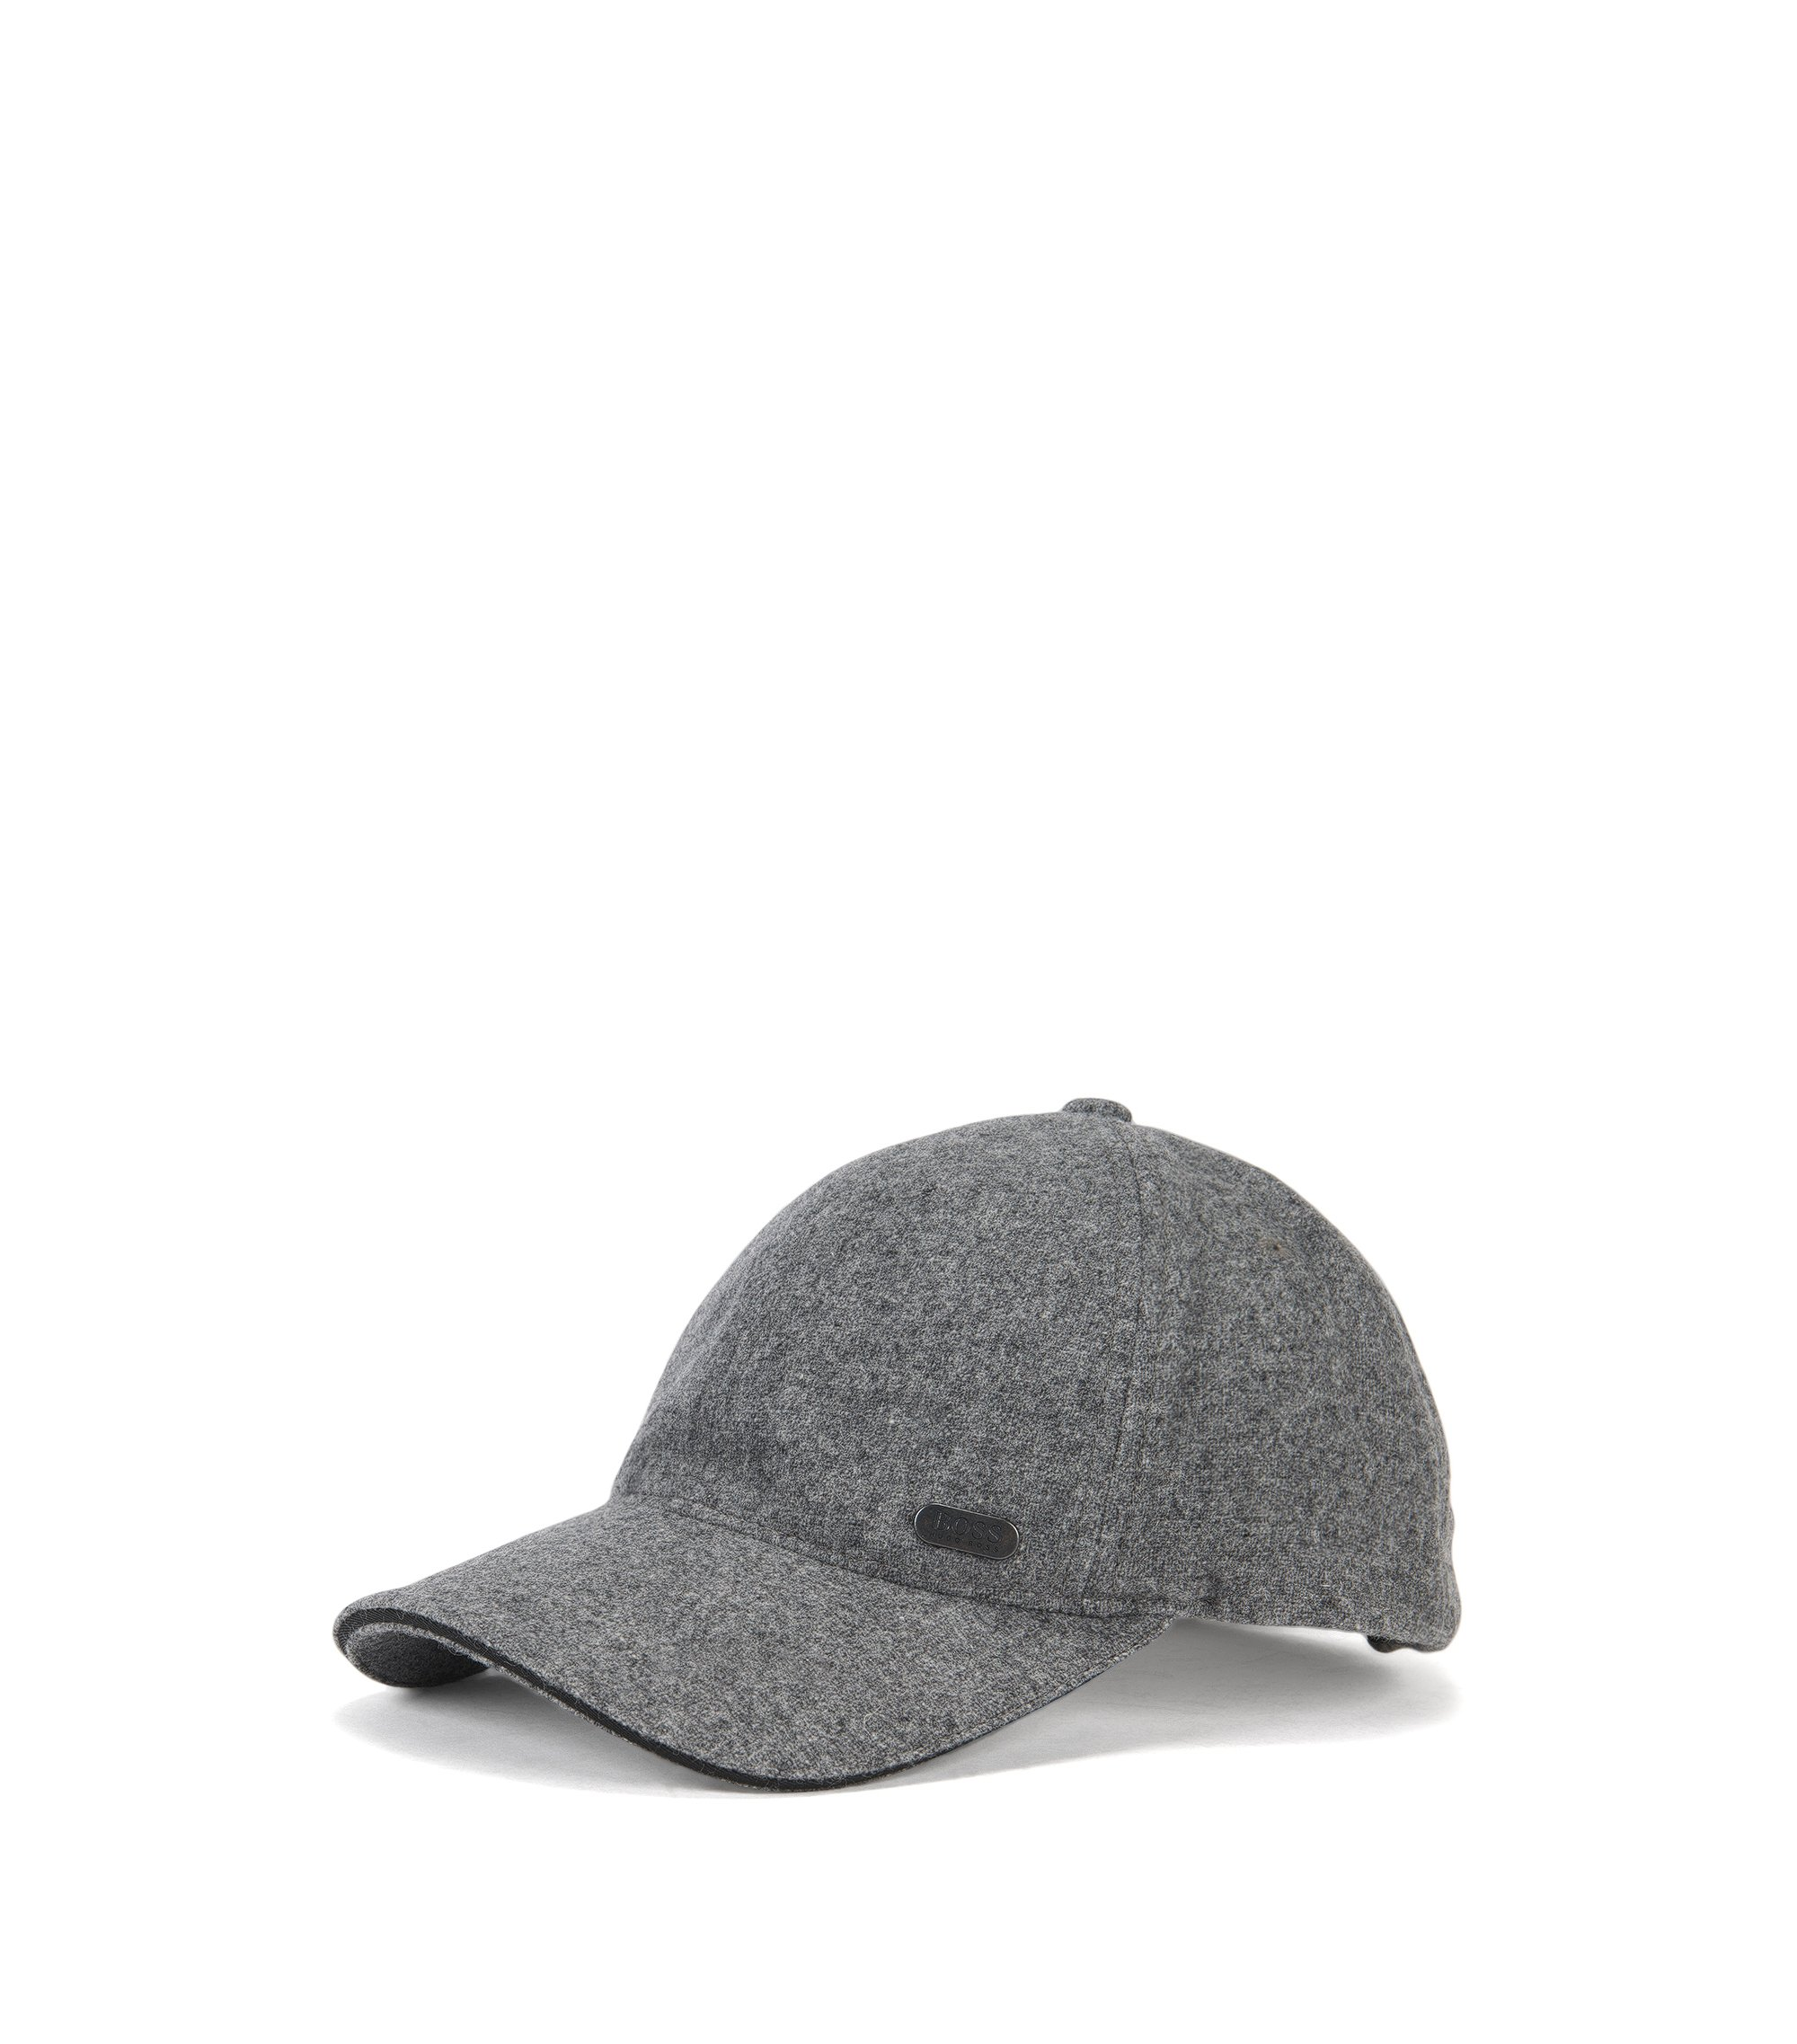 Baseball Cap aus elastischem Woll-Mix, Grau